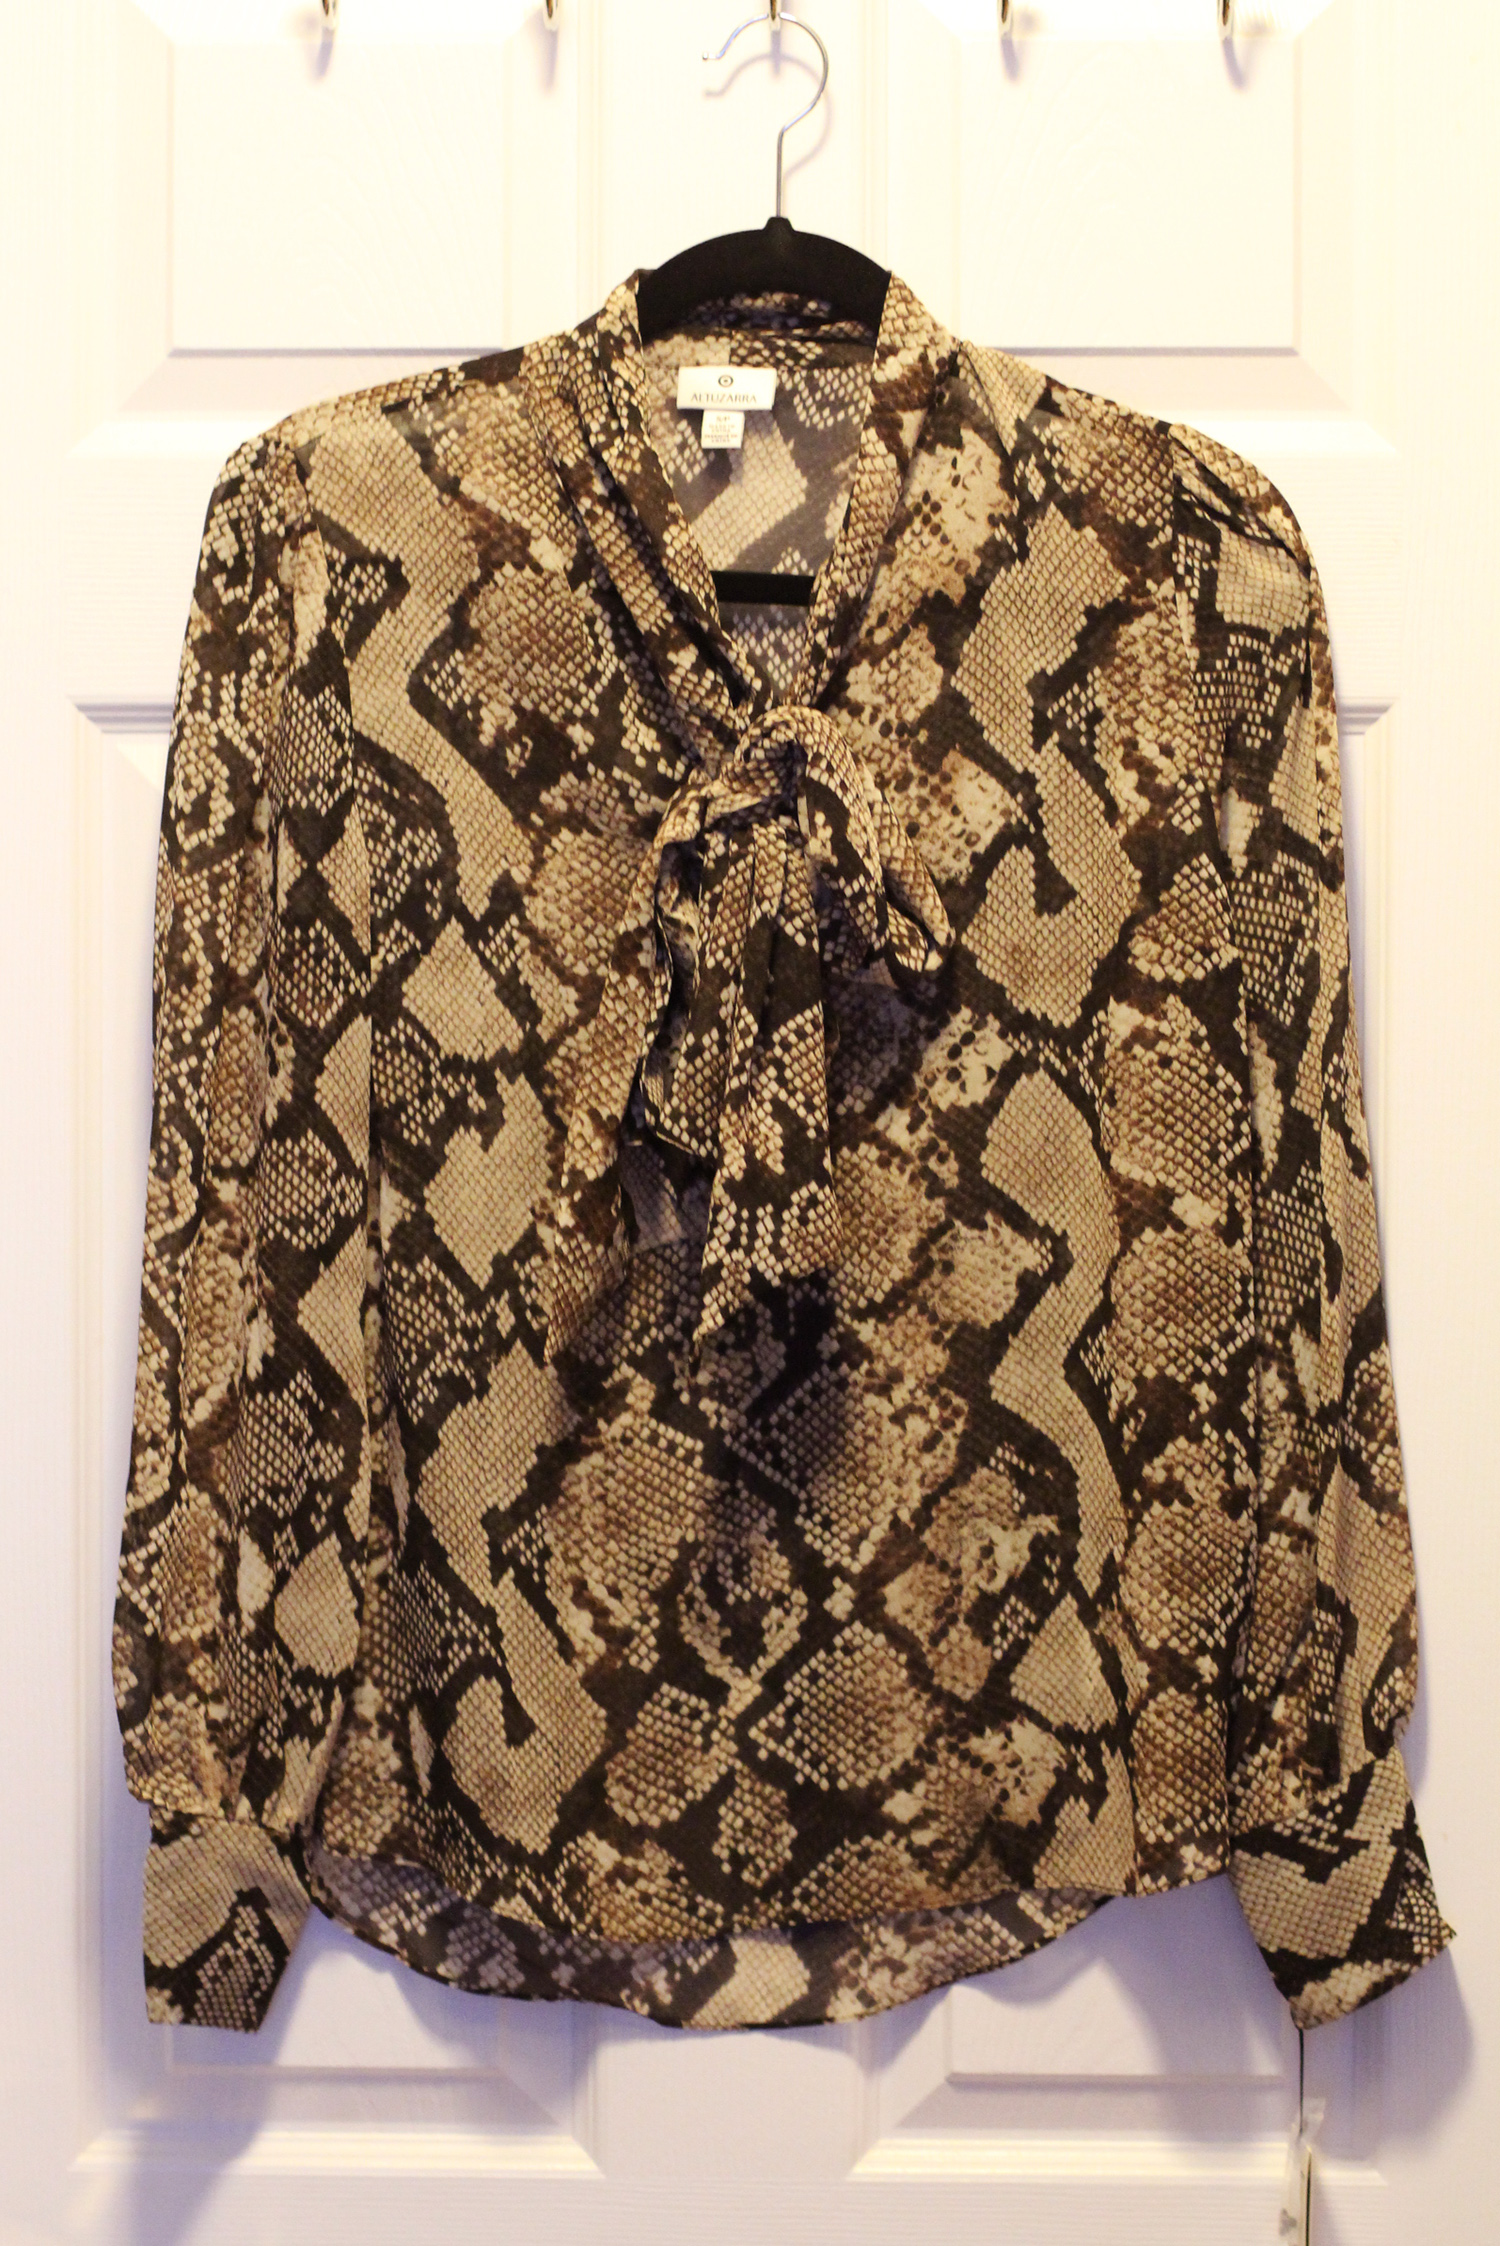 altuzarra for target snakeskin shirt